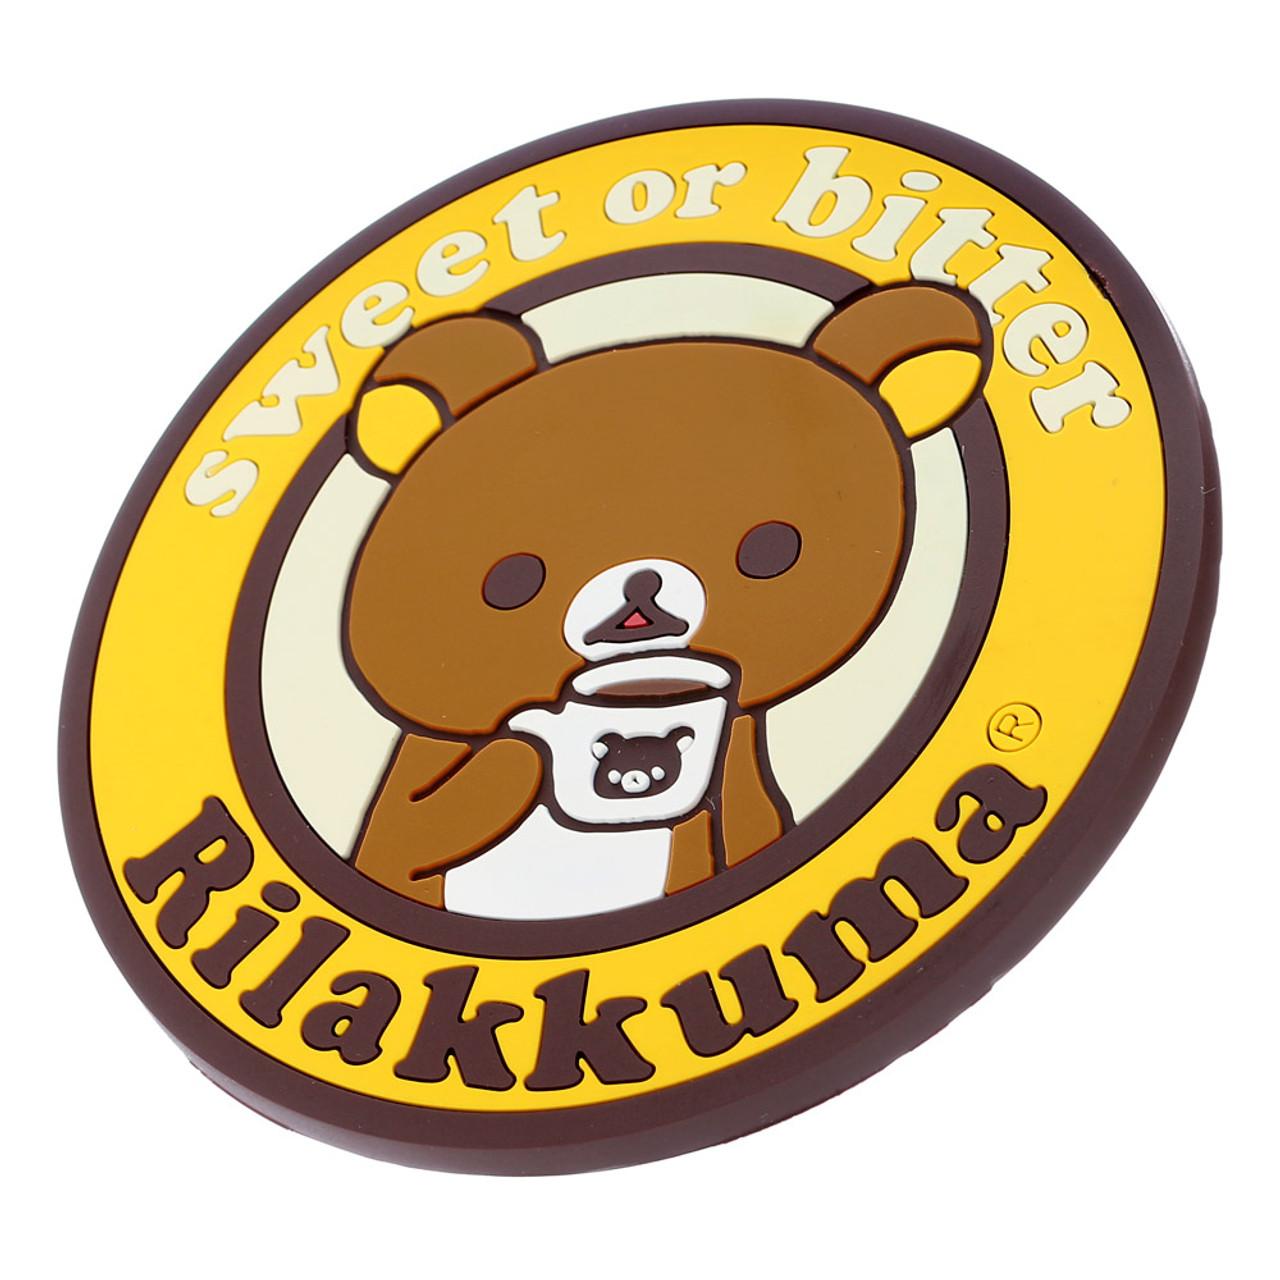 San-x Rilakkuma Circle Chocolate Coffee Cup Coaster - KY00901 ( Side )